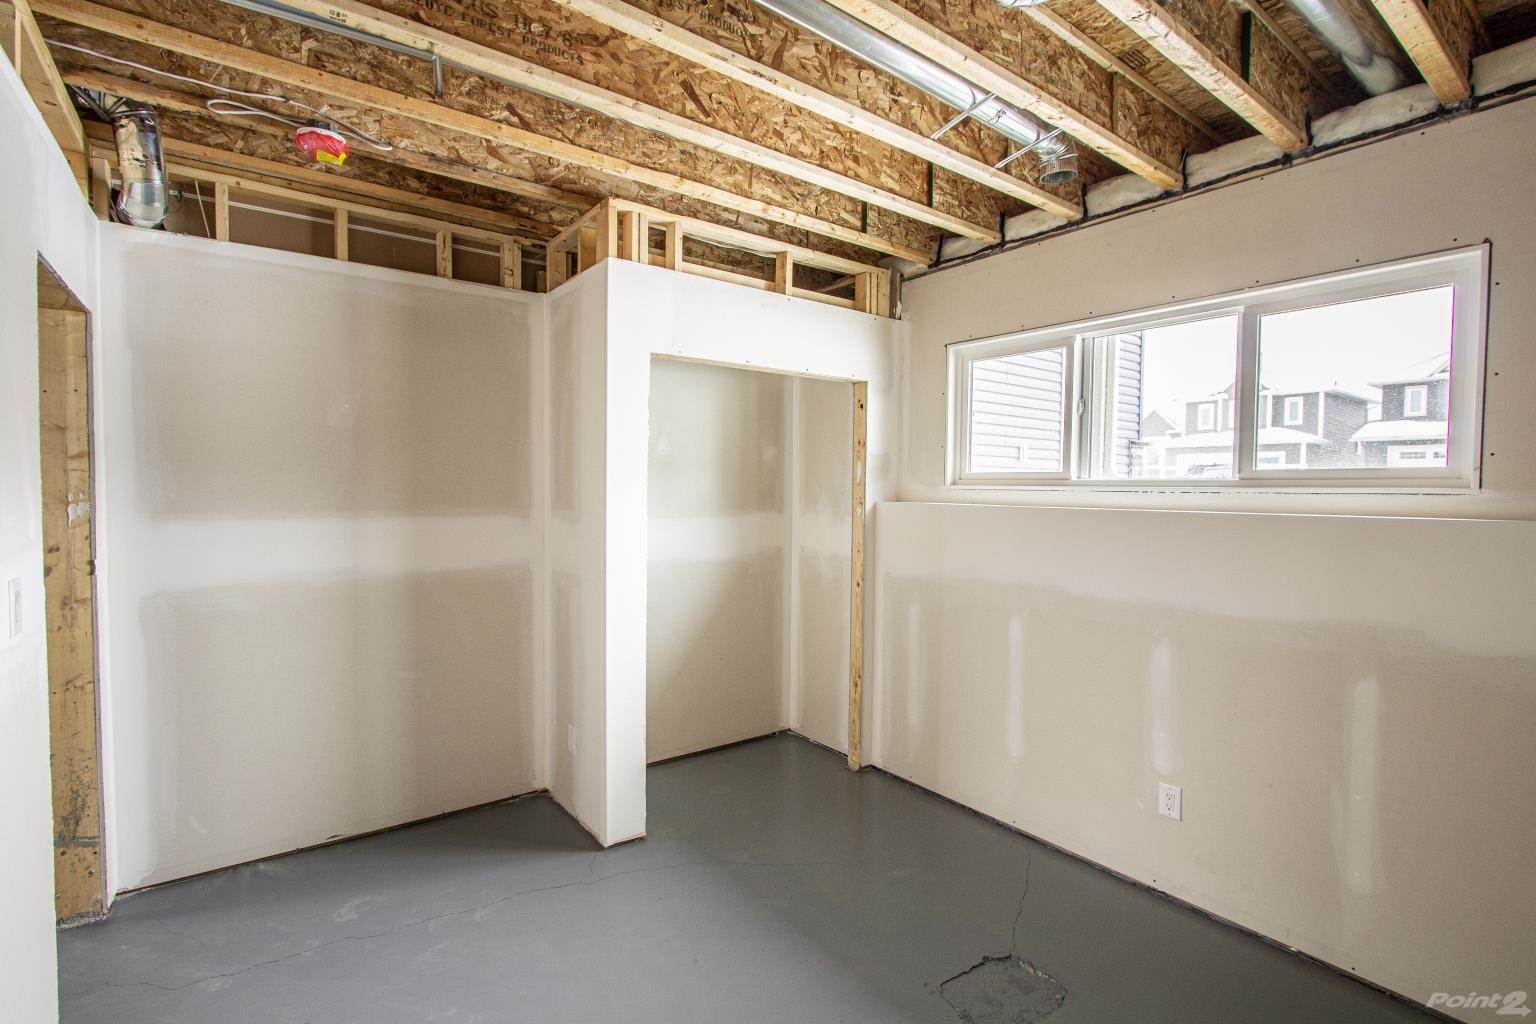 215 Terra Nova Cres in Cold Lake - House For Sale : MLS# e4225242 Photo 12